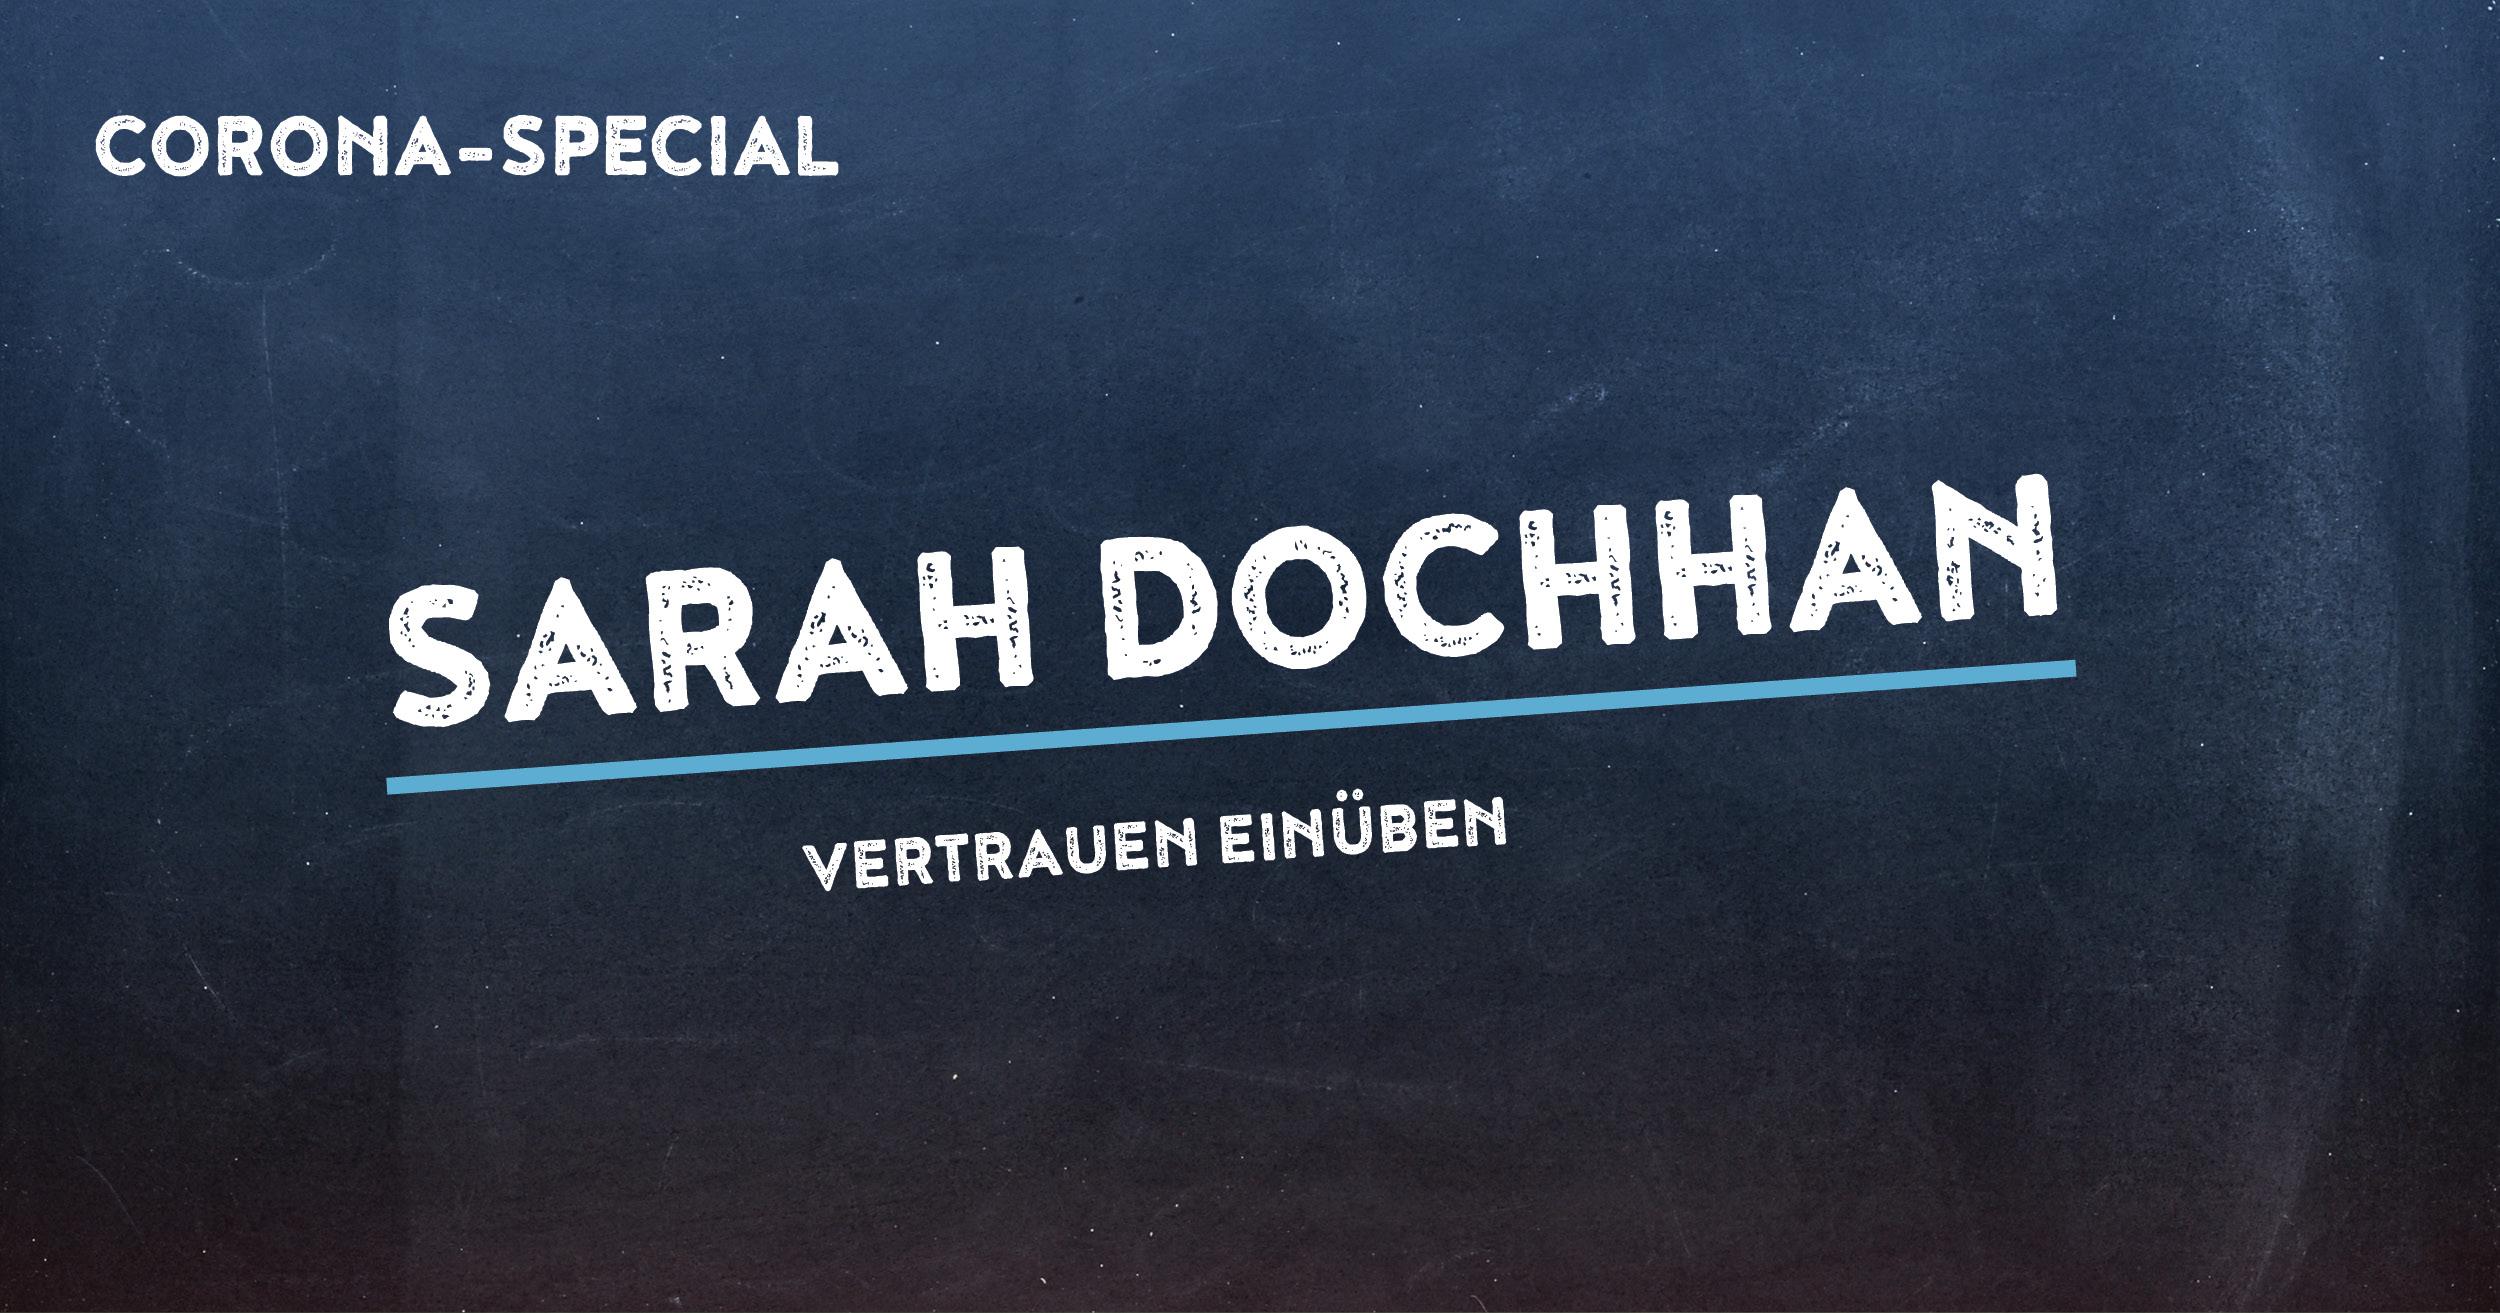 Corona-Special 3 | Sarah Dochhan